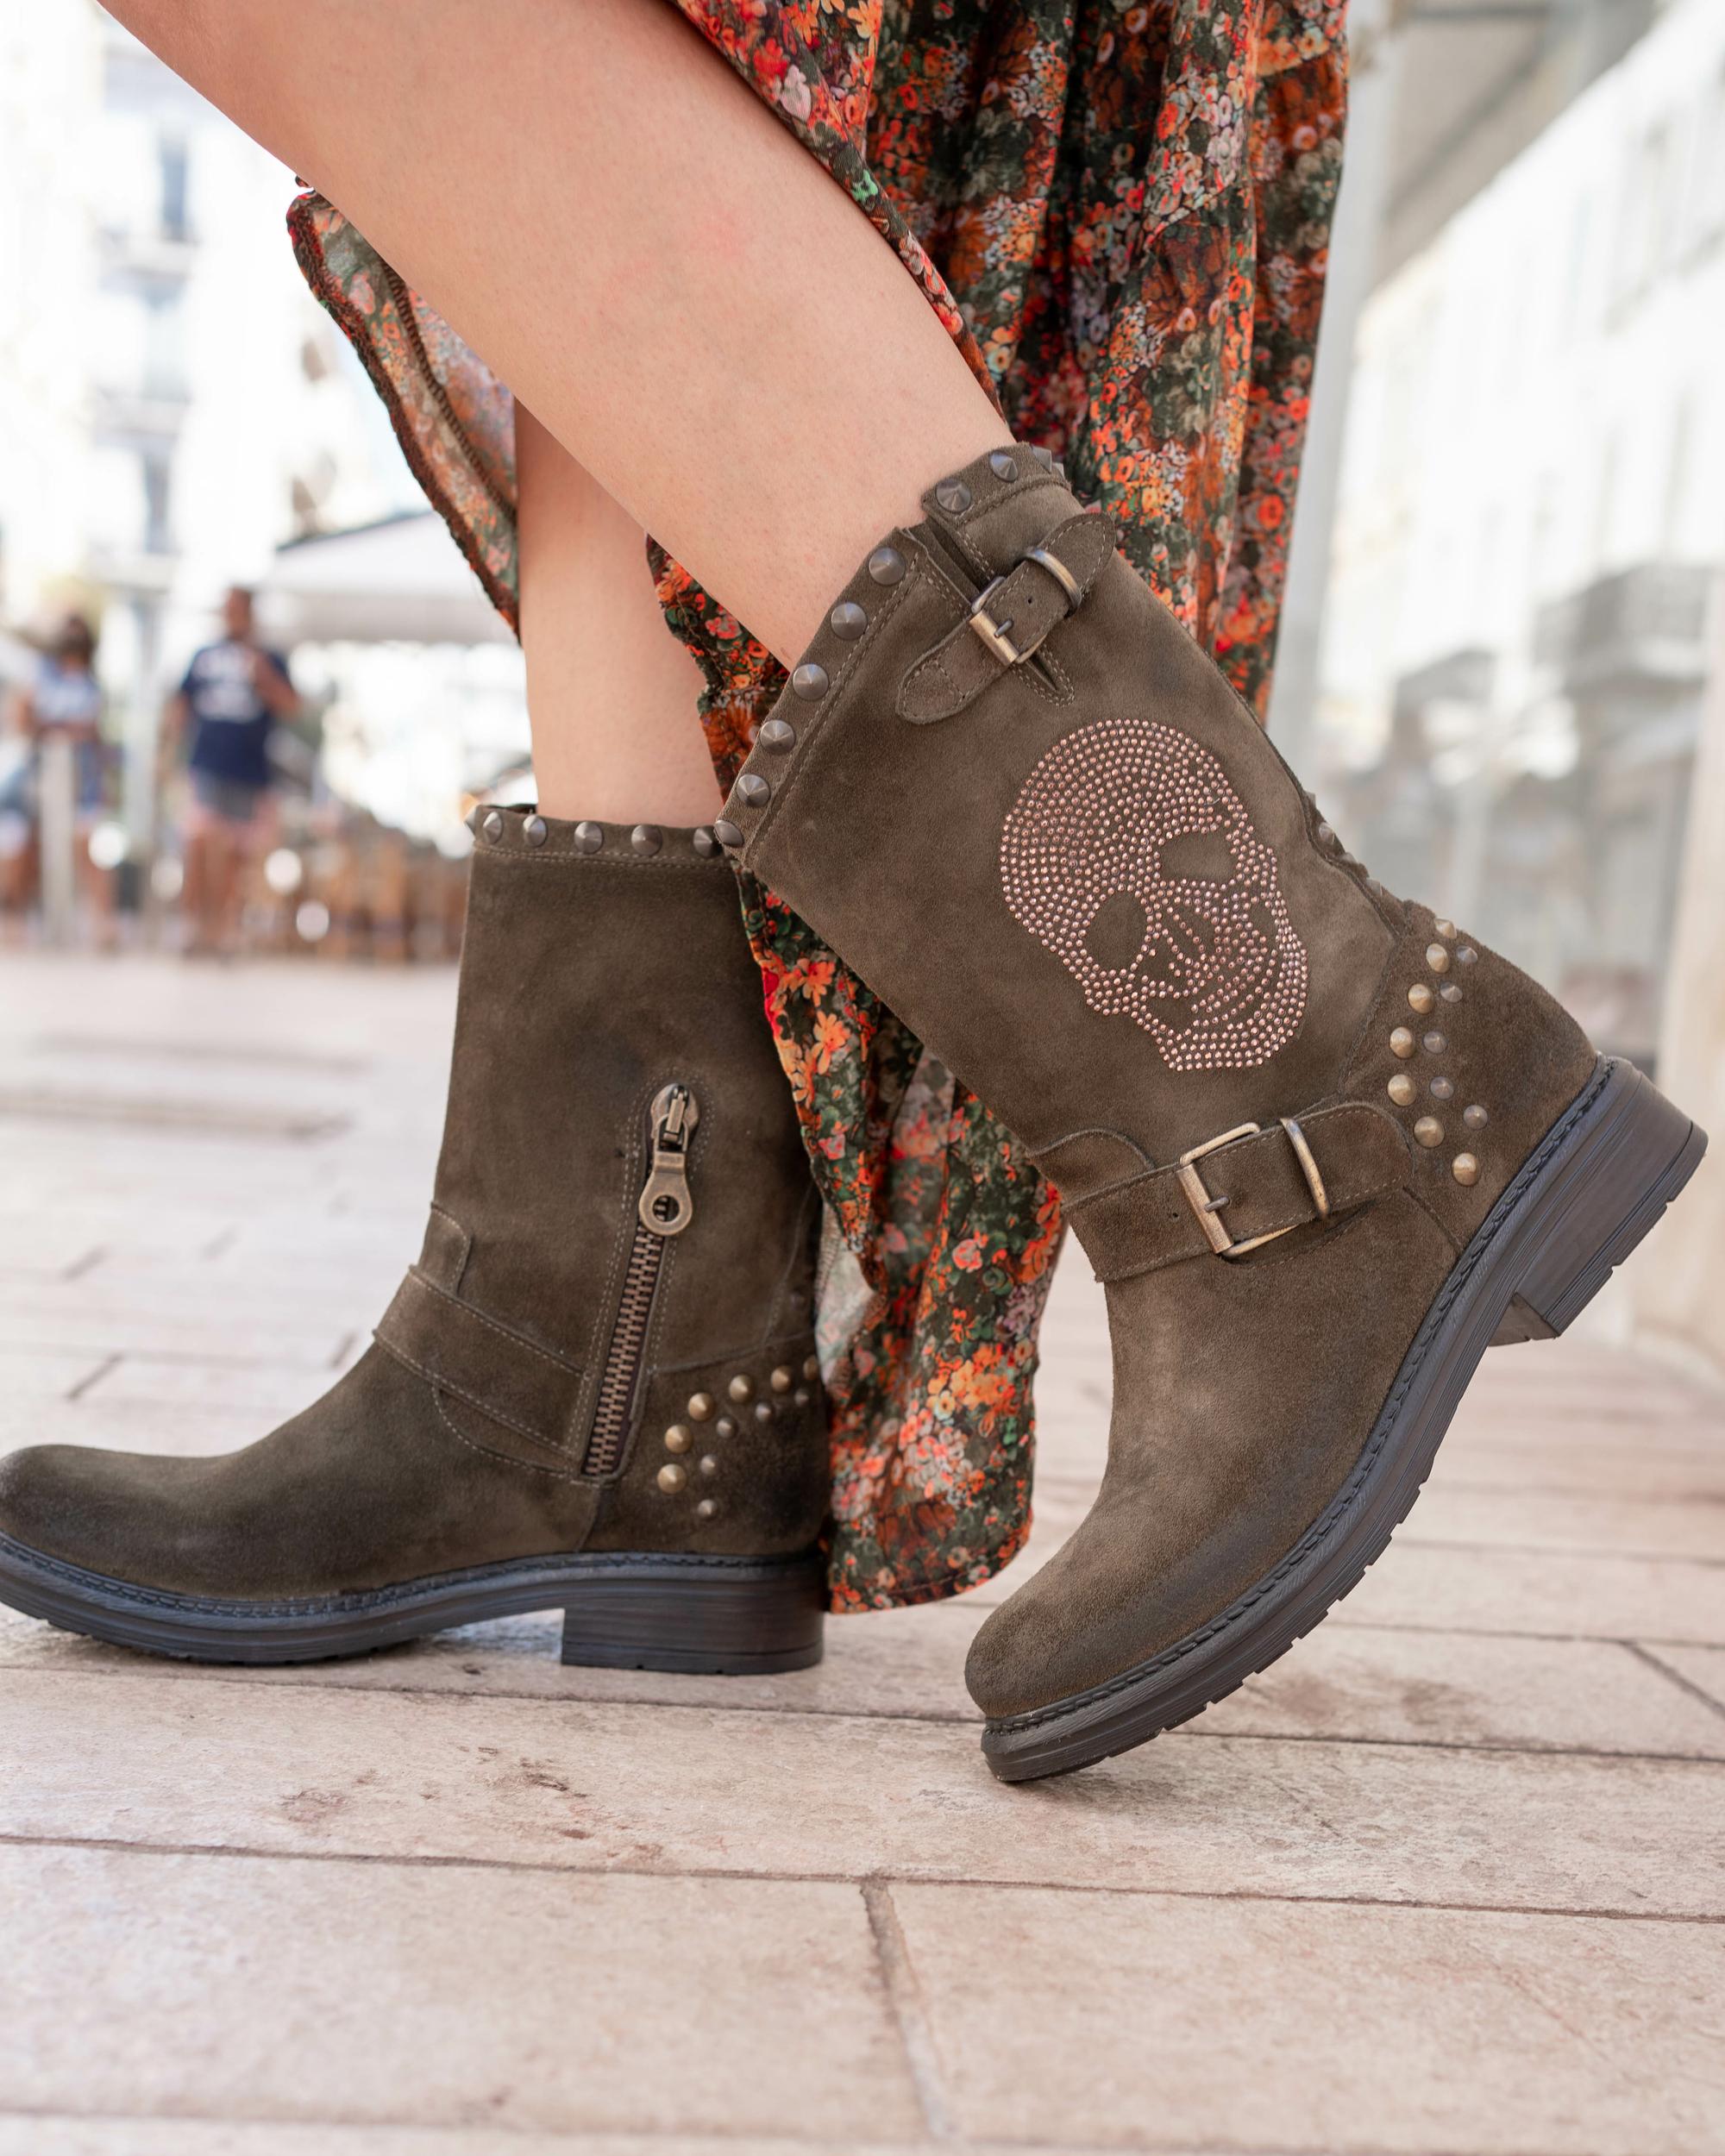 Bottines louisiane kaki Chantal B